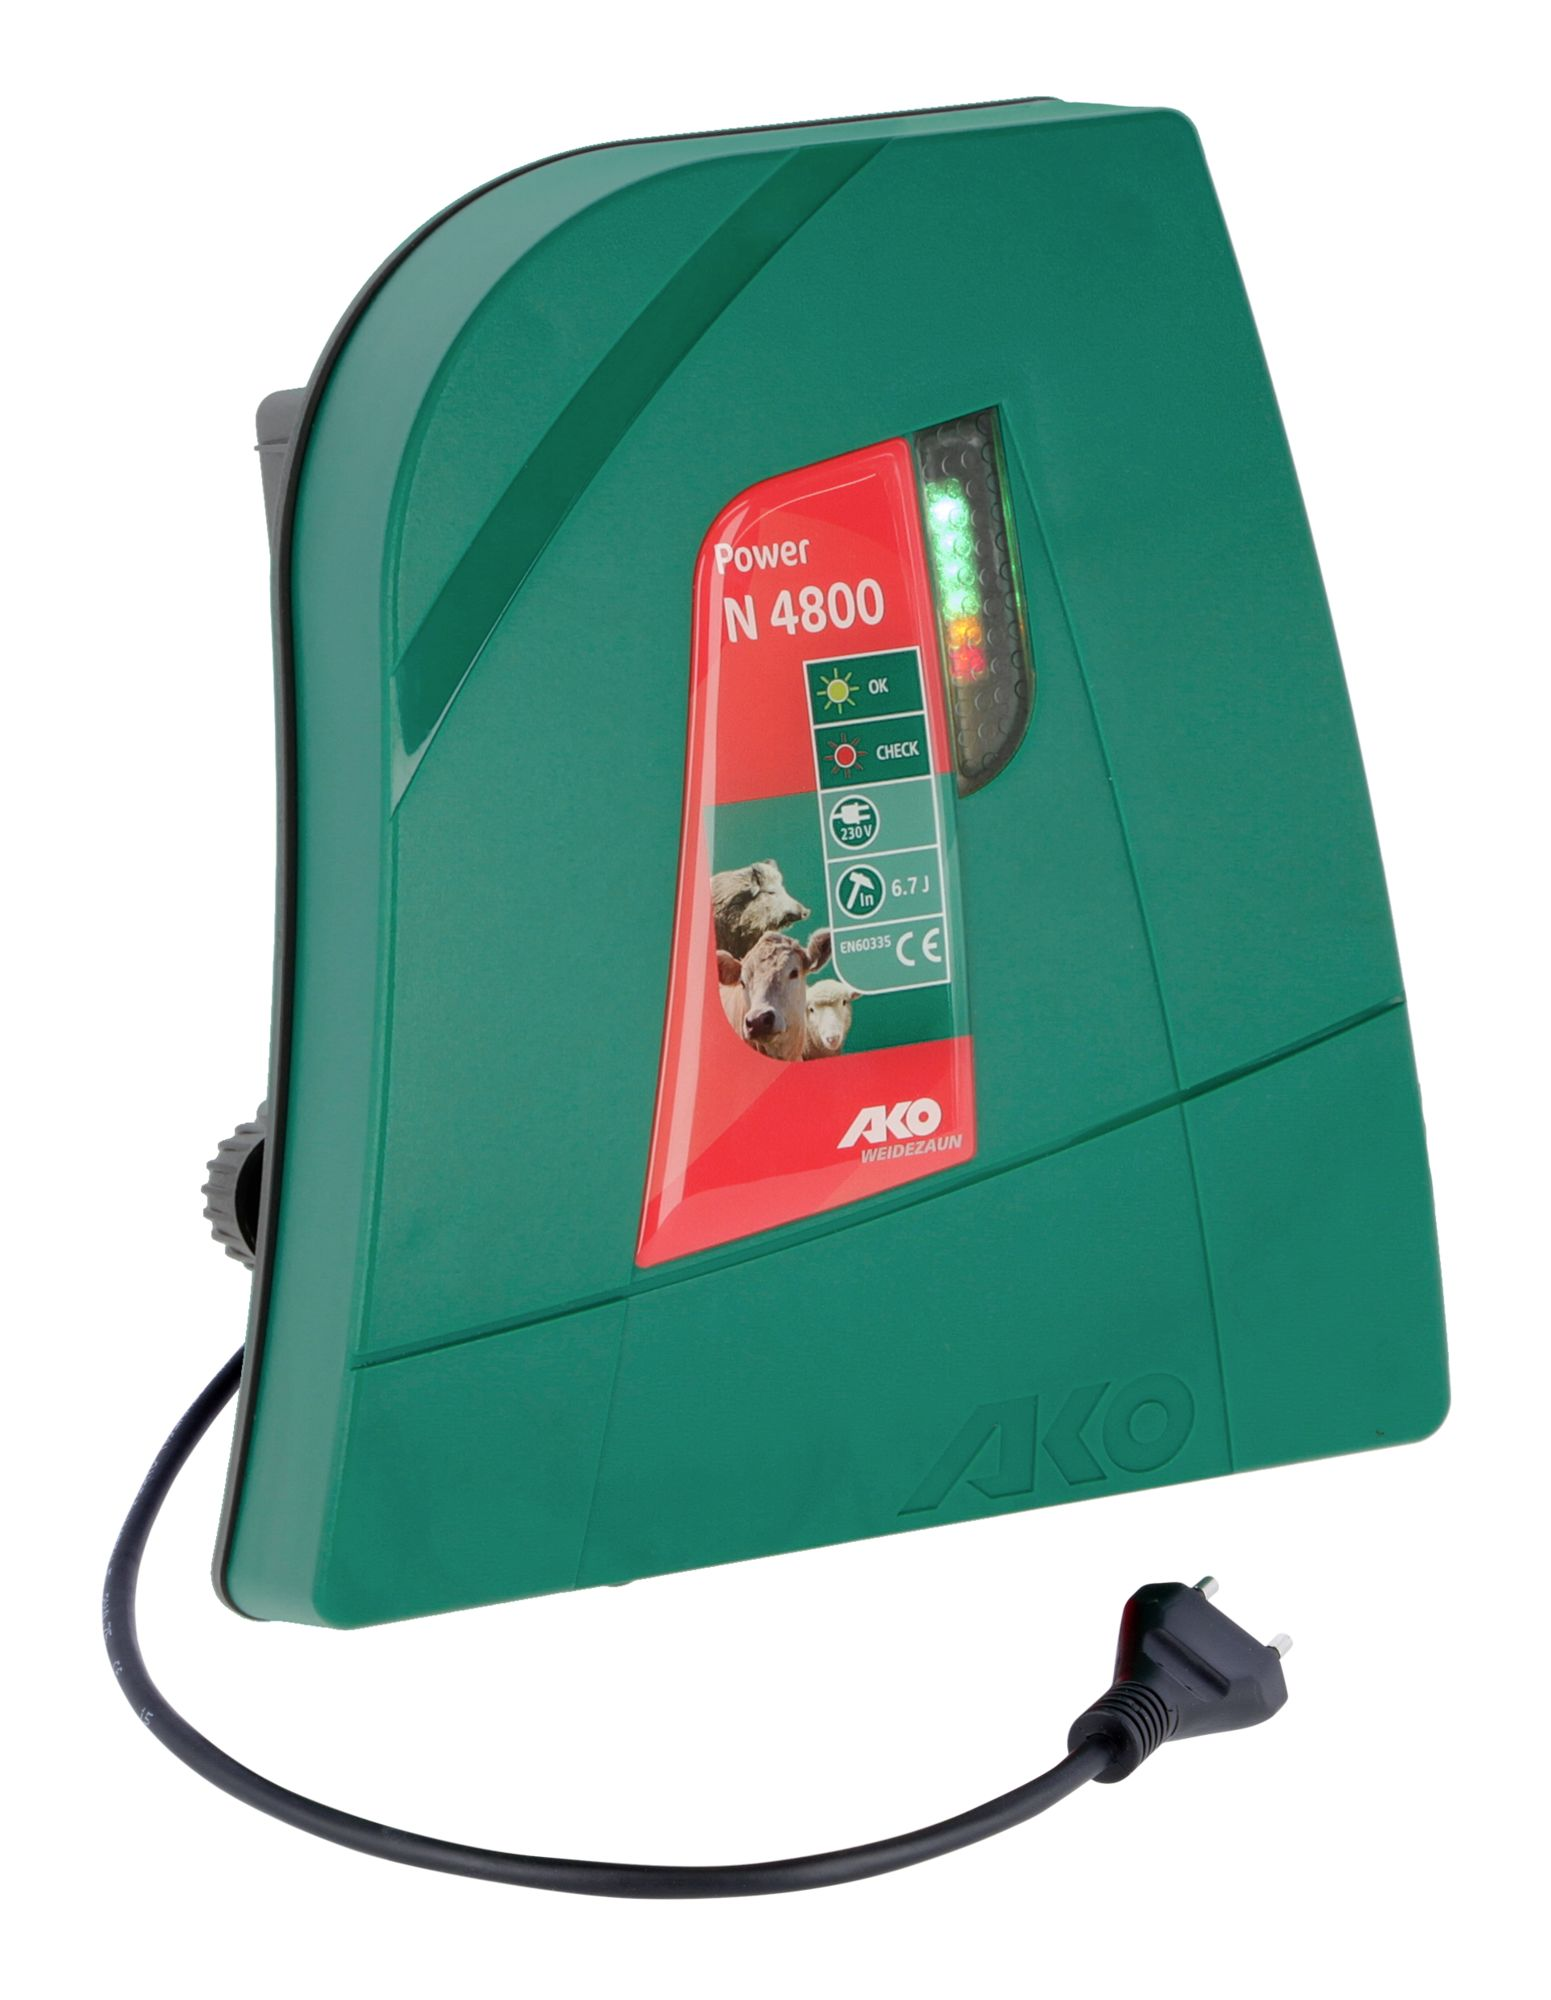 Weidezaungerät Power Profi NDi 6500 digital von AKO 230 V Netzgerät Elektrozaun